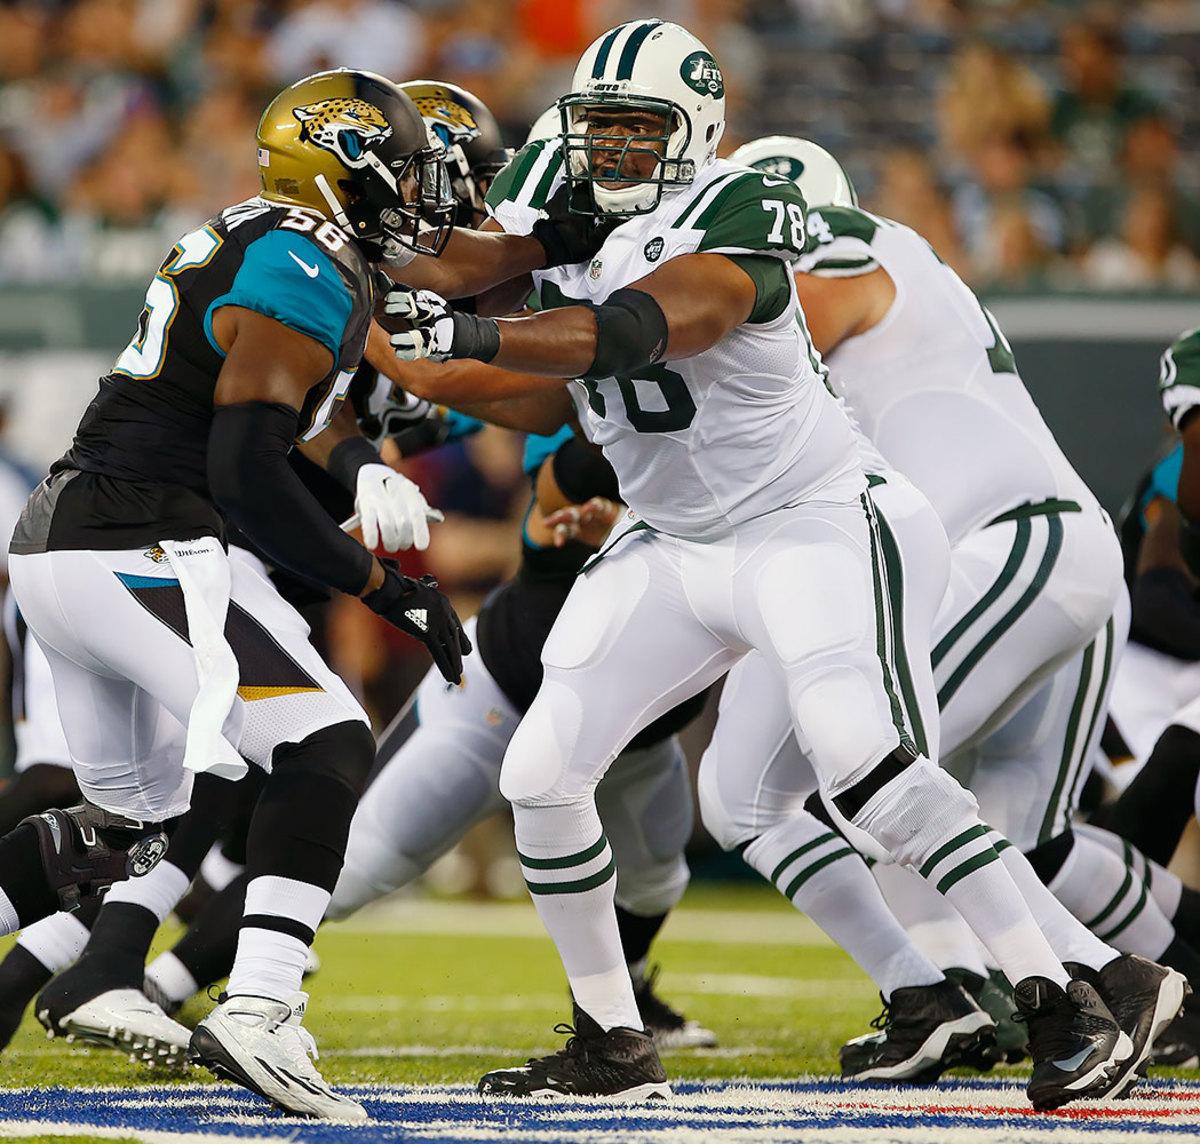 Ryan-Clady-New-York-Jets.jpg